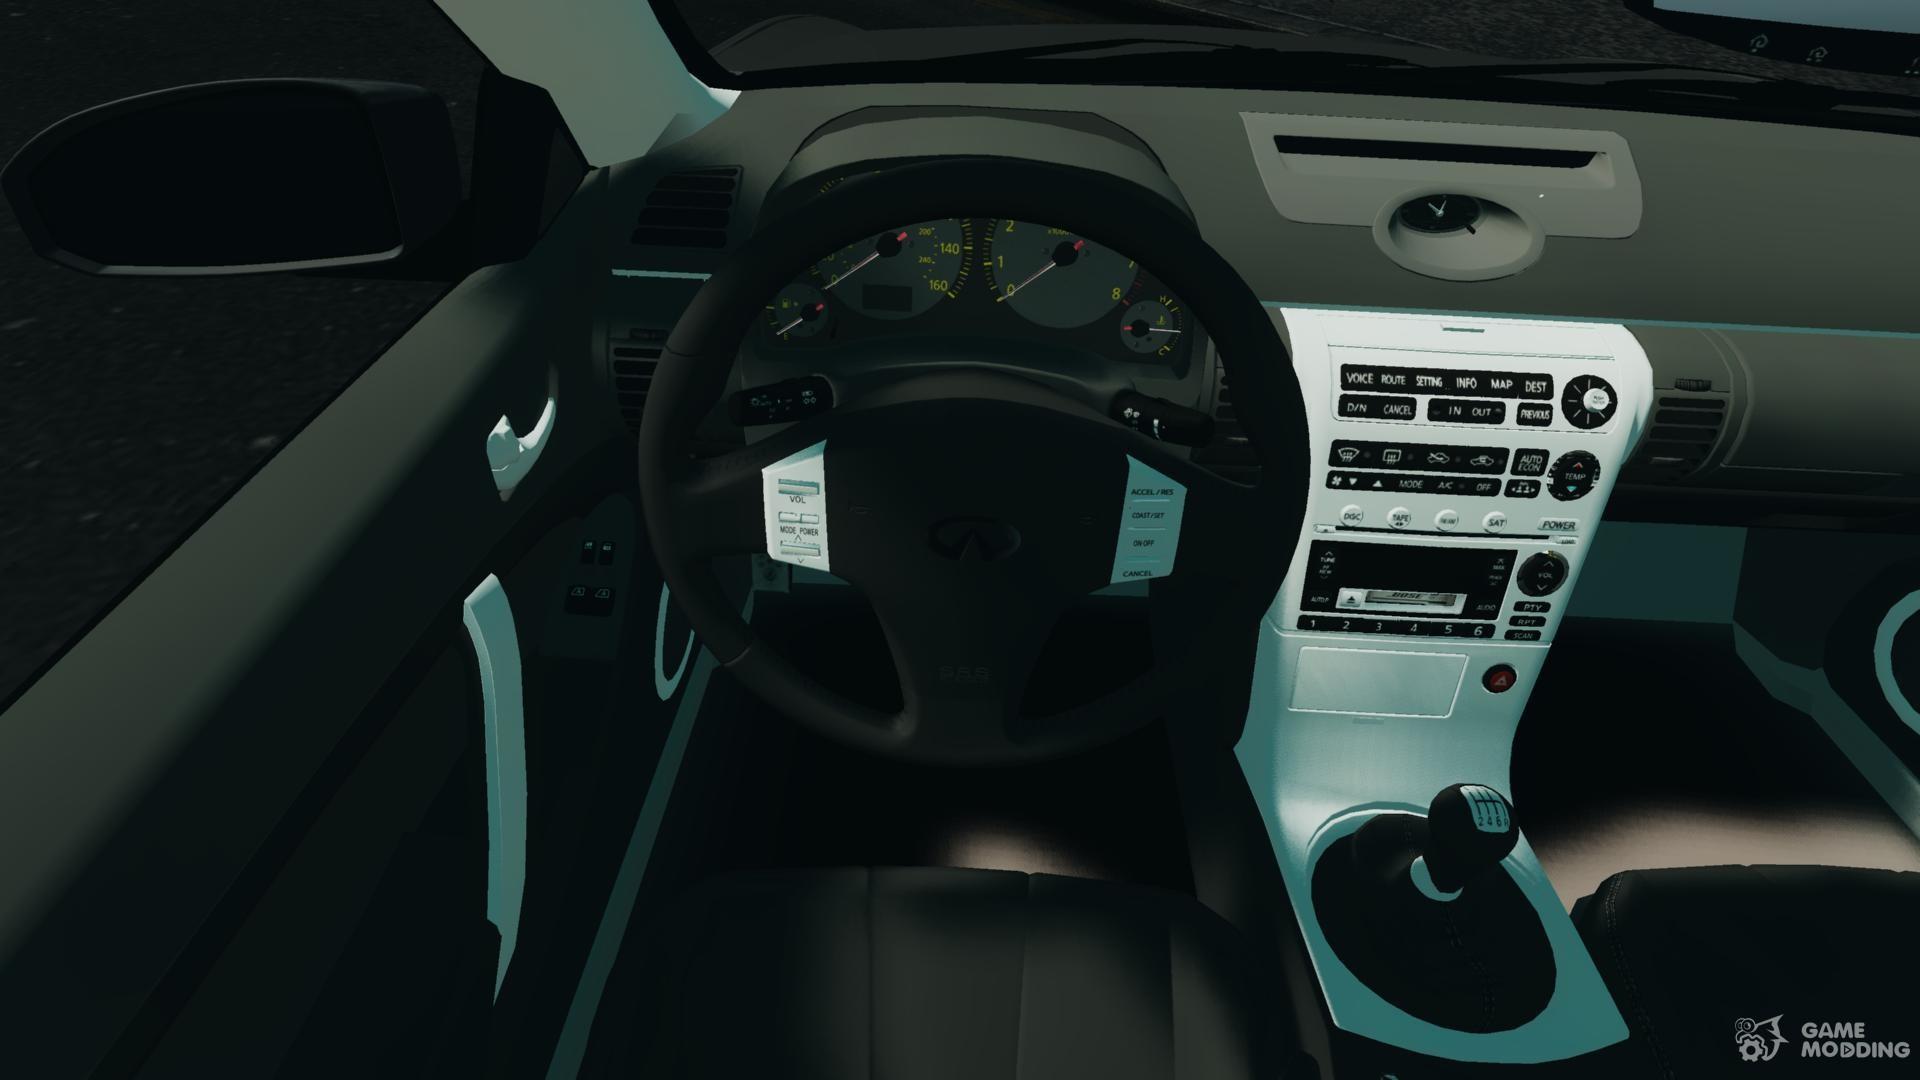 Infiniti g35 coupe 2003 jdm tune for gta 4 infiniti g35 coupe 2003 jdm tune for gta 4 side view vanachro Images